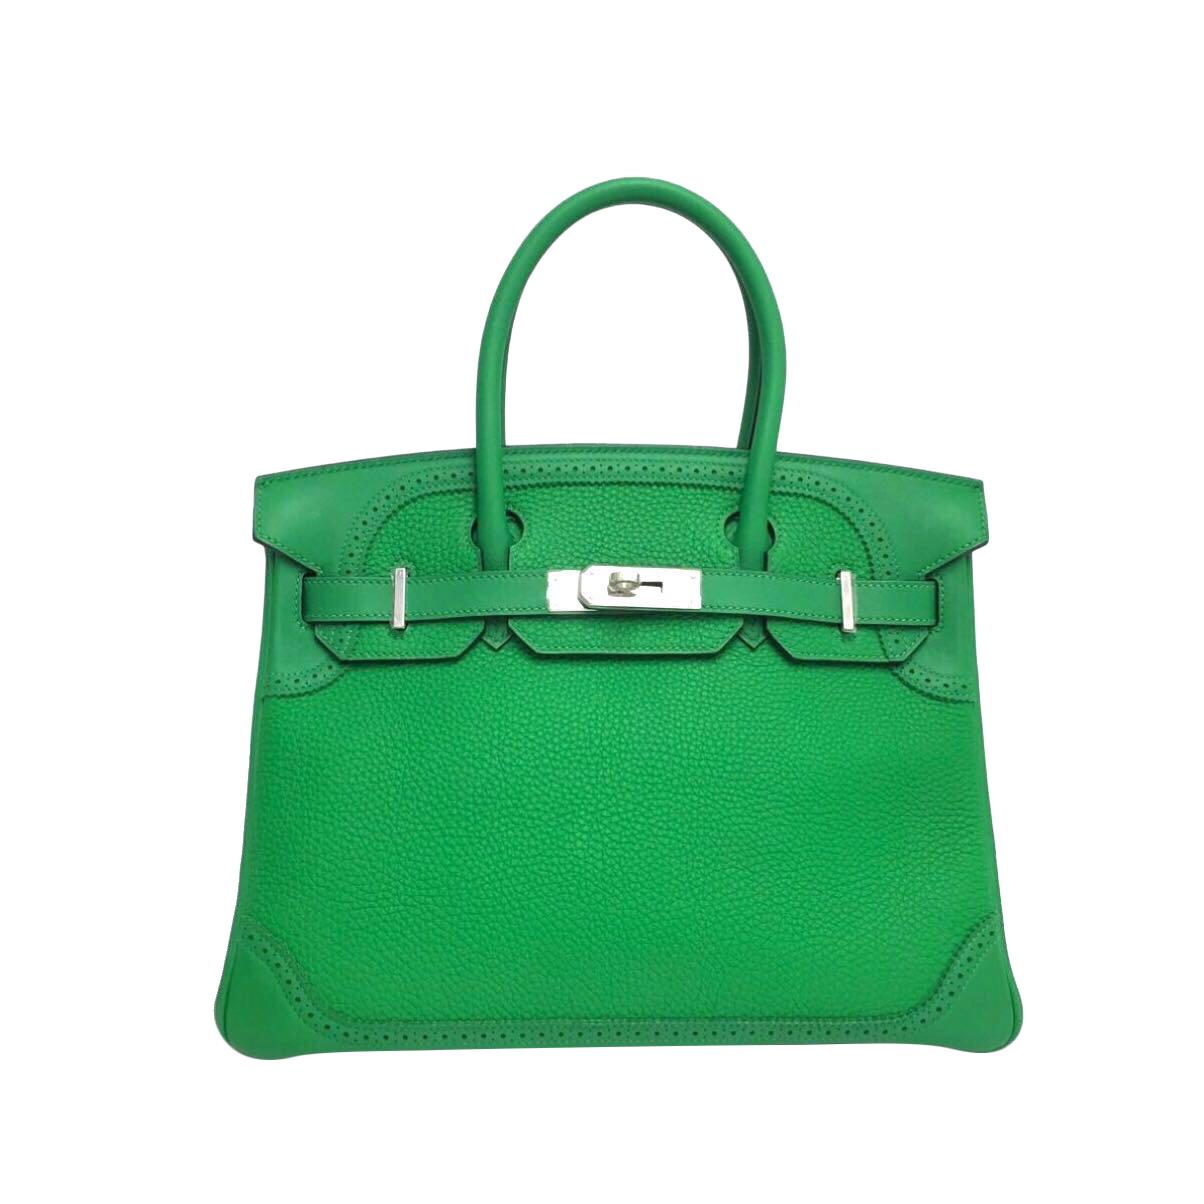 Hermès Birkin 30  Edition Ghillies